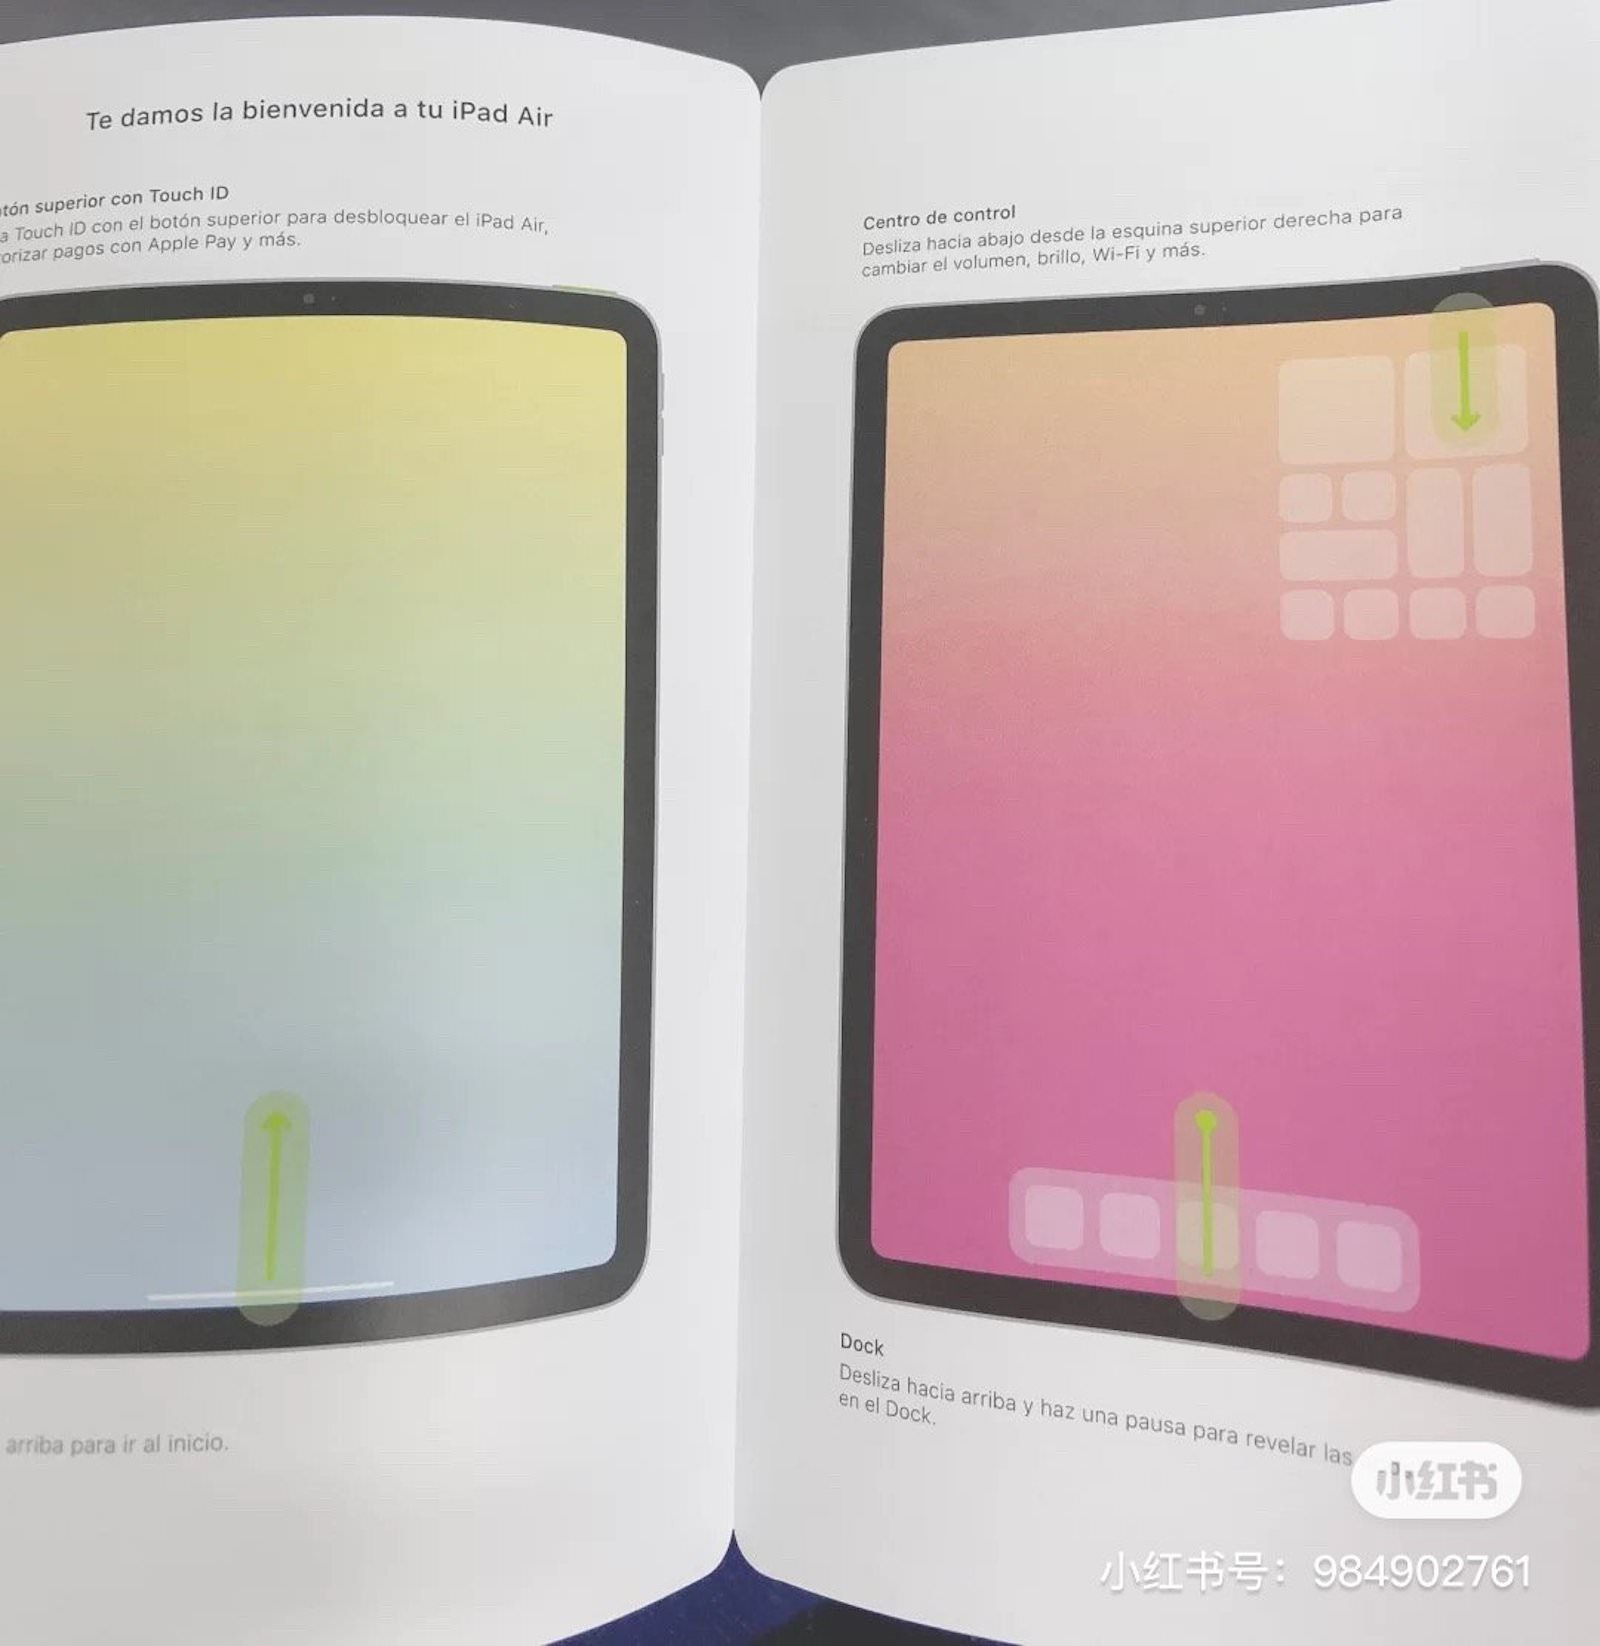 New-iPad_air-leak.jpeg